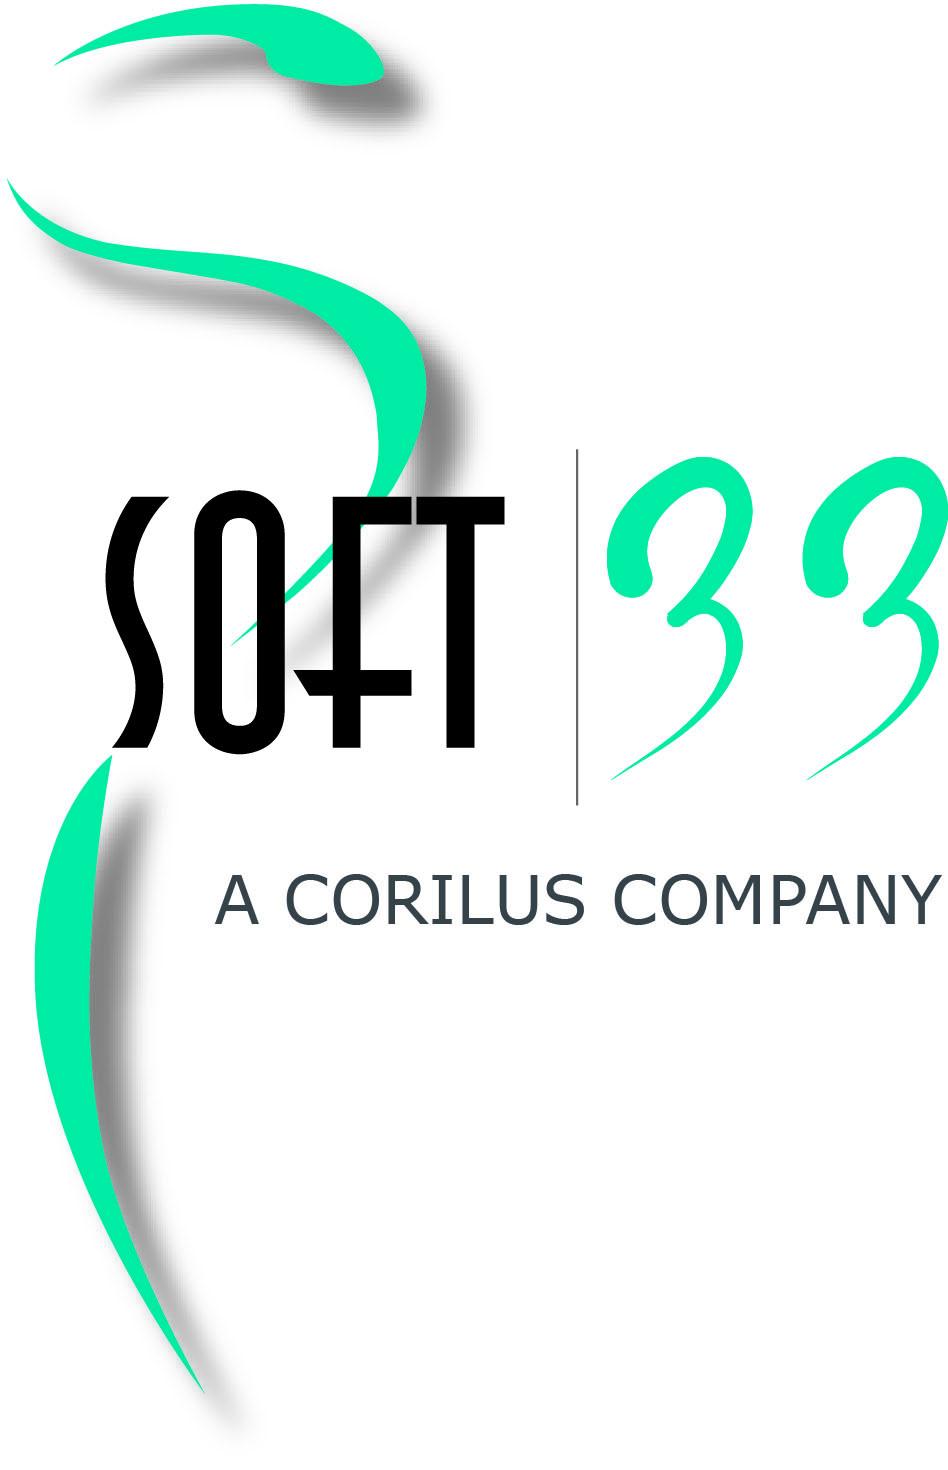 Soft33